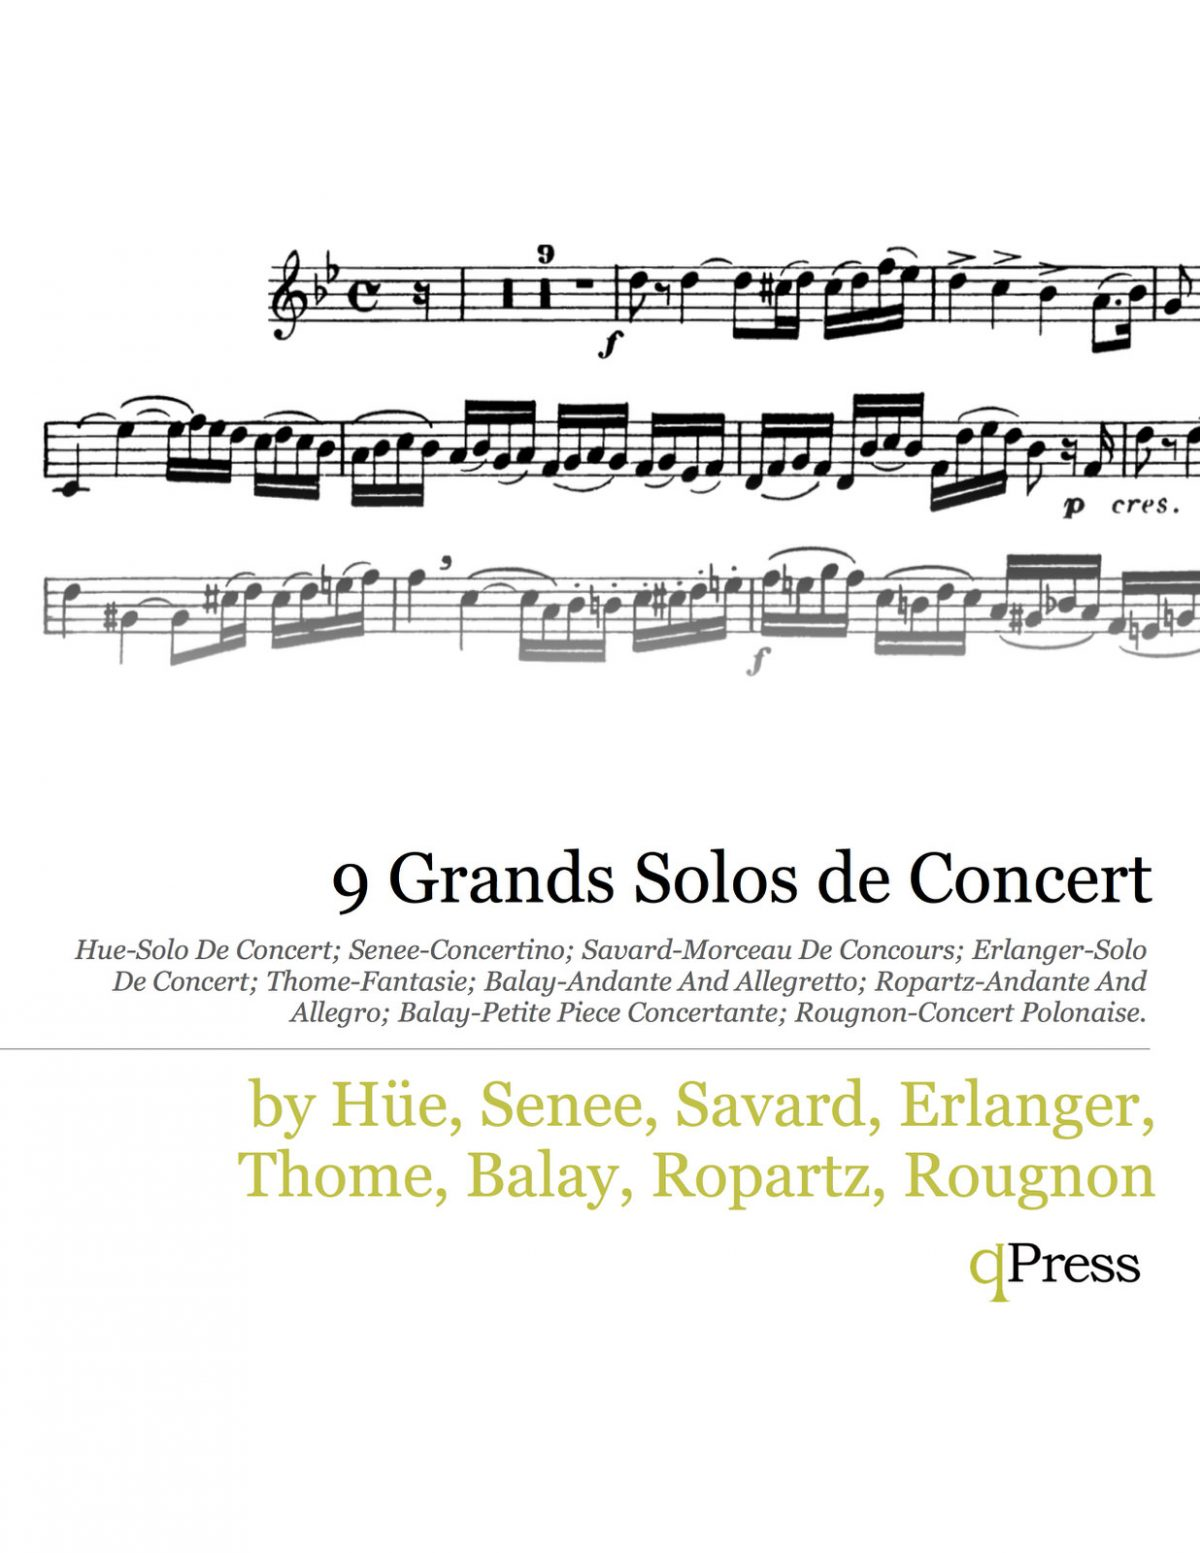 Various, 9 Grands Solos de Concert